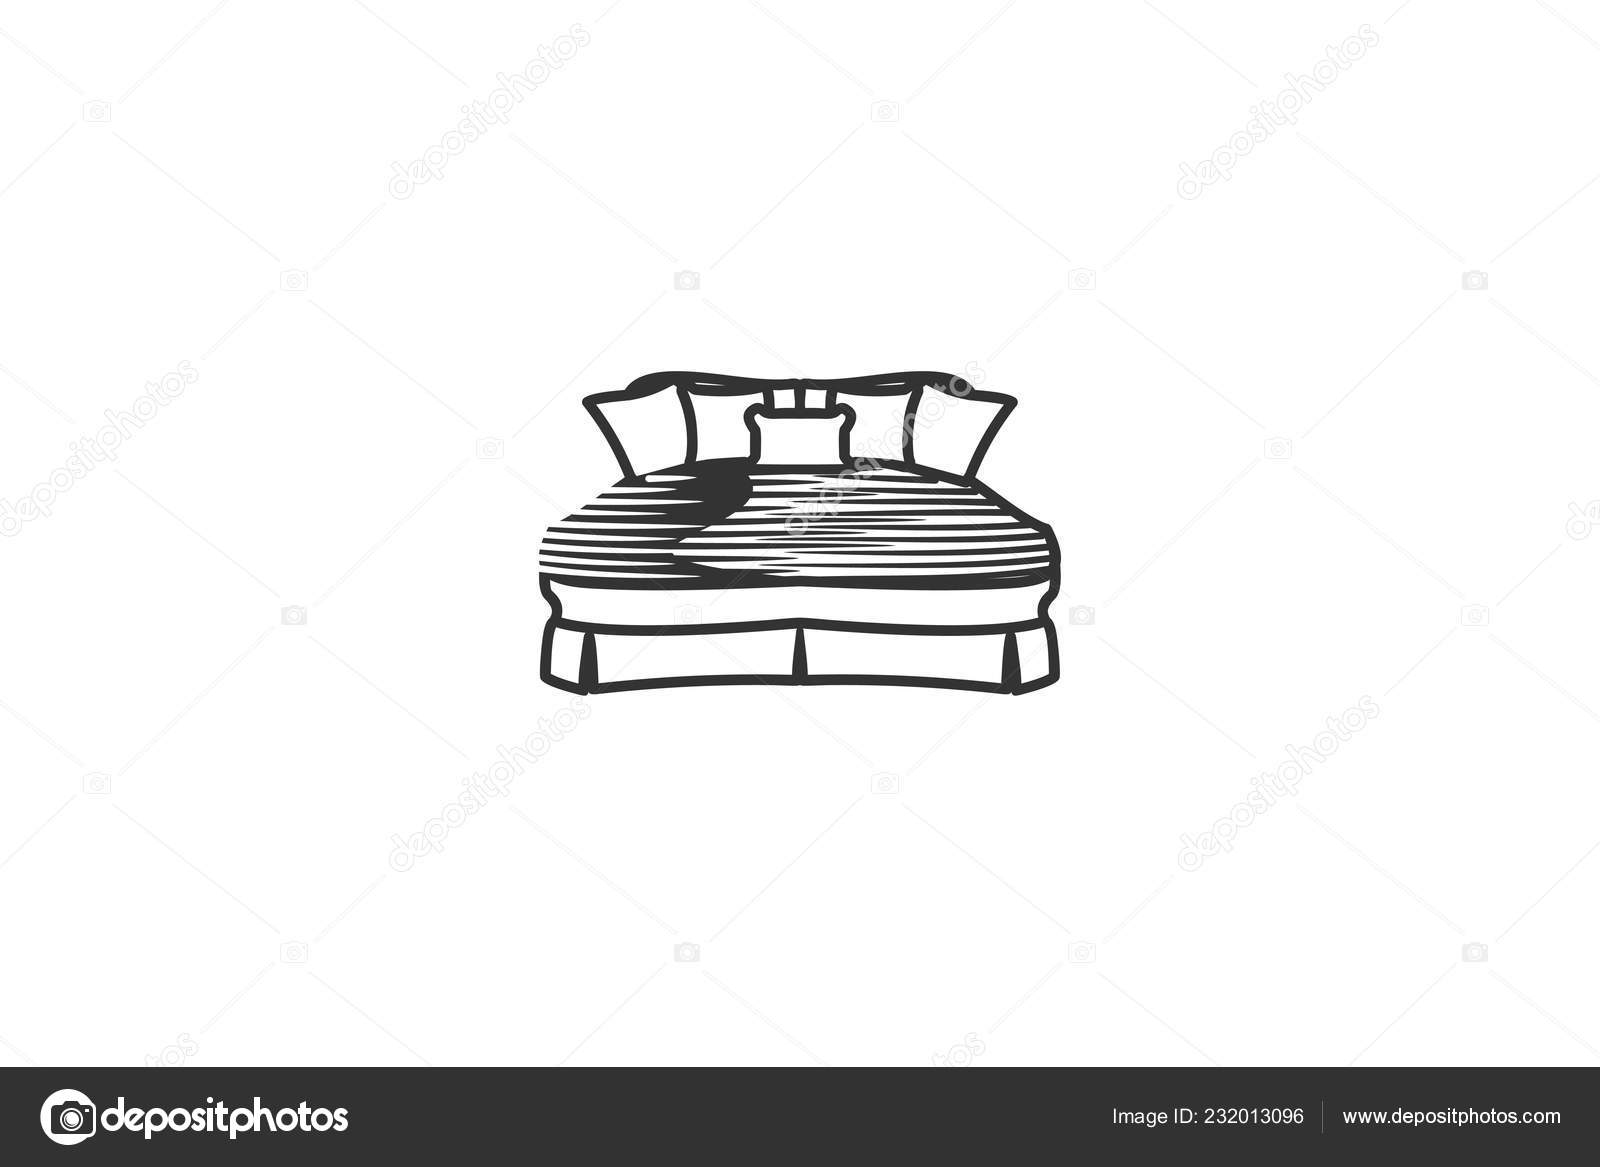 Mattress Mono Line Logo Designs Inspiration Isolated White Background Stock Vector C Wangsinawang 232013096